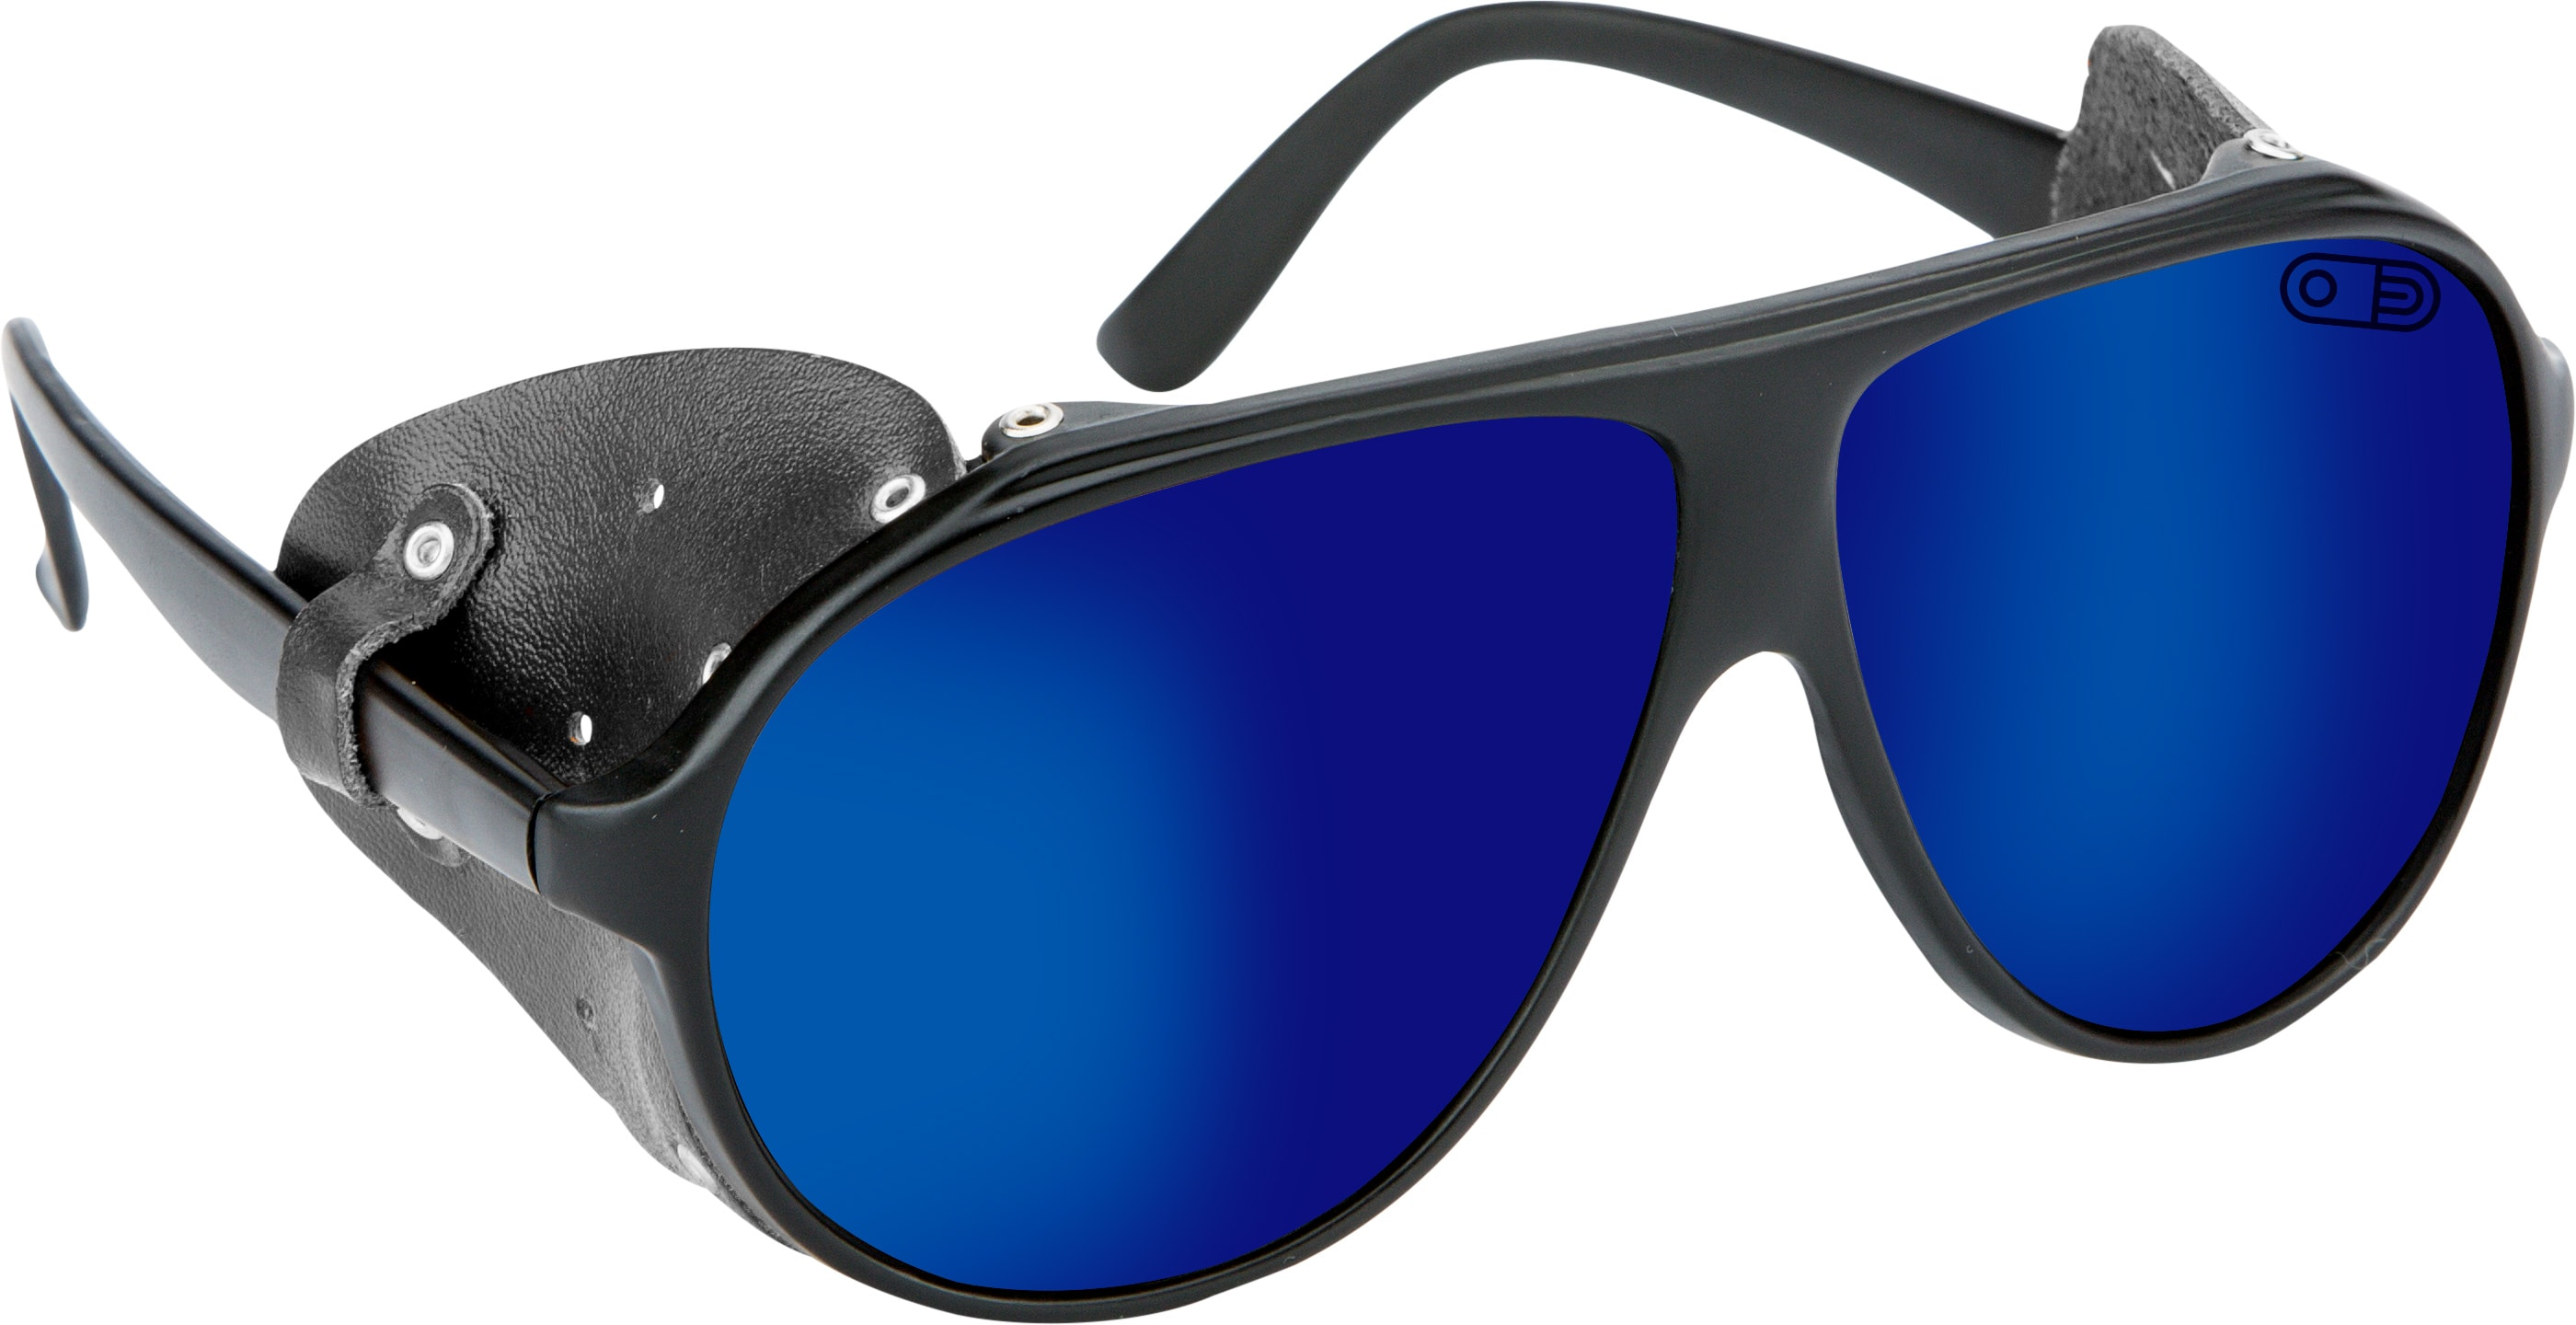 6c0d1a226f4 Airblaster Polarized Glacier Sunglasses - thumbnail 1